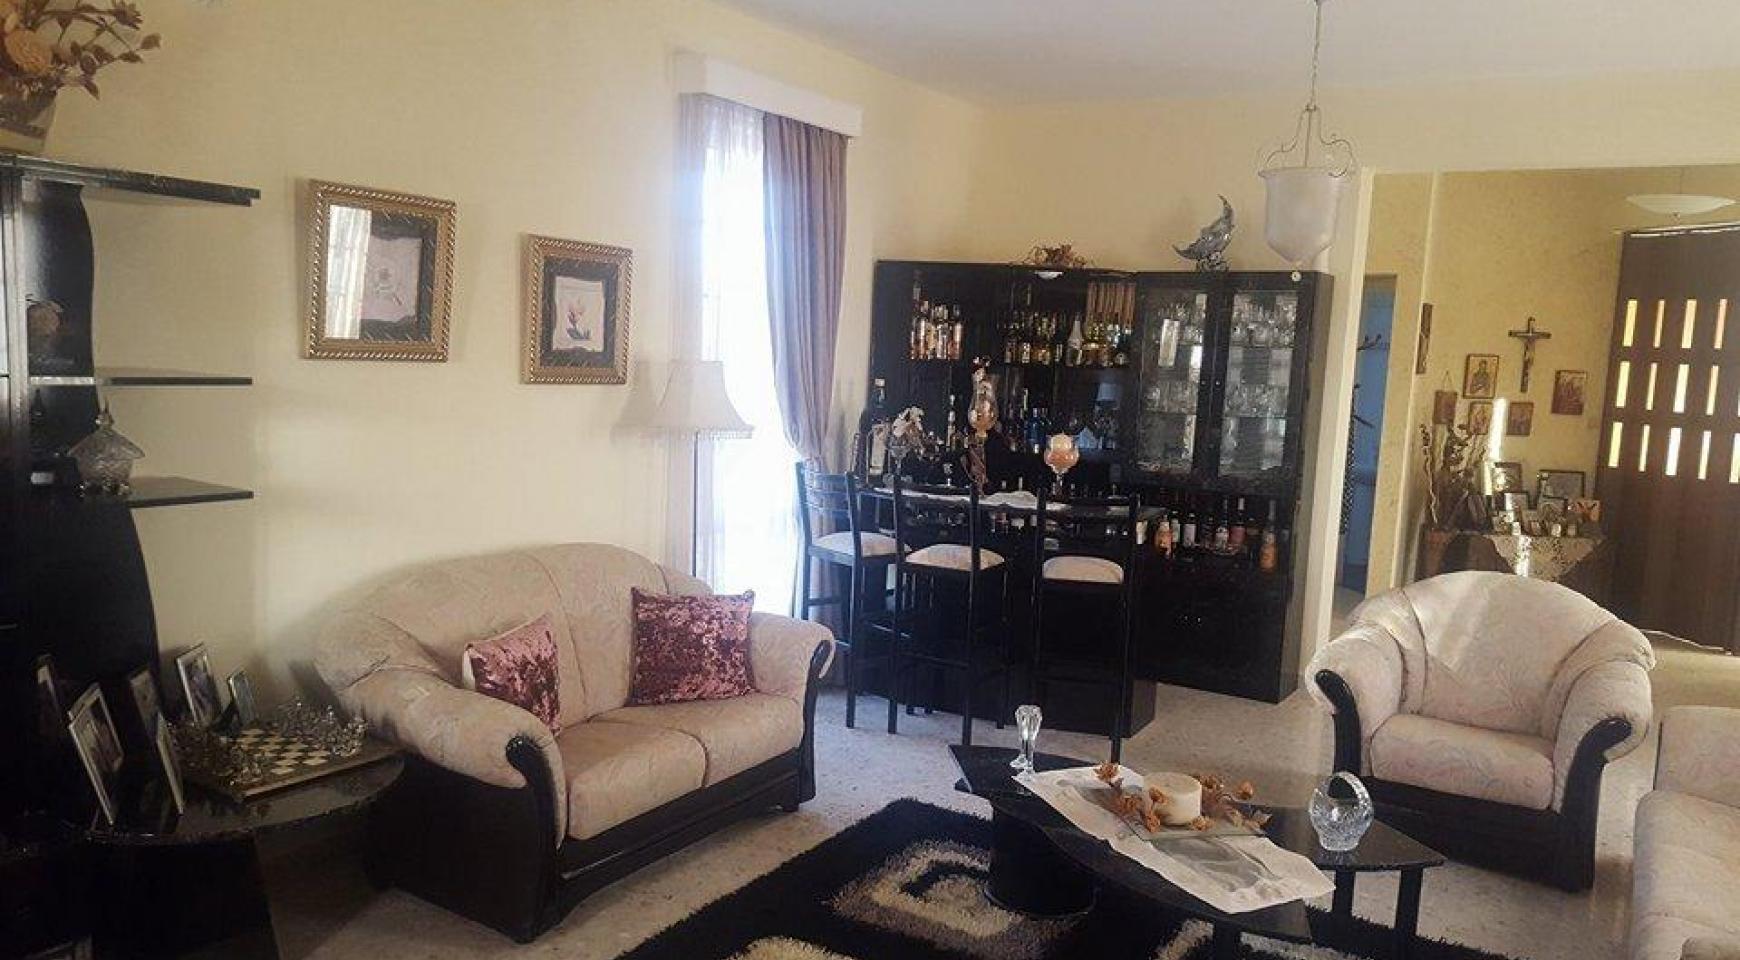 3 Bedroom Villa in Cape Greco - 2